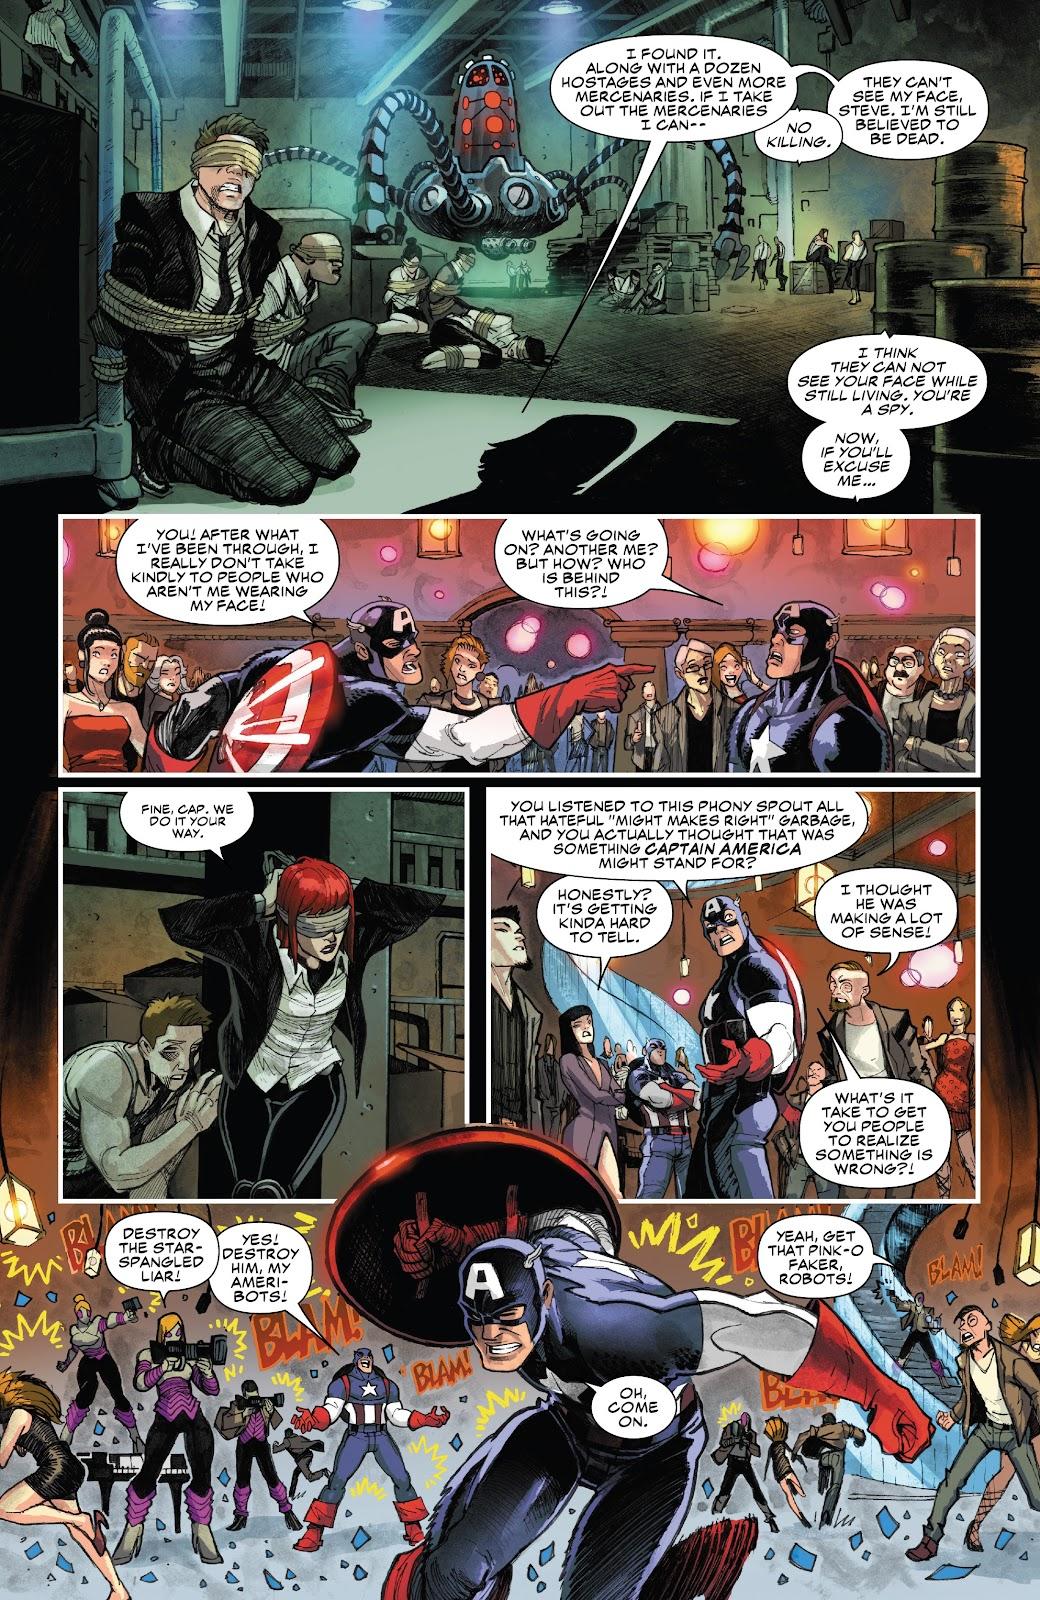 Read online Black Widow (2019) comic -  Issue #1 - 7